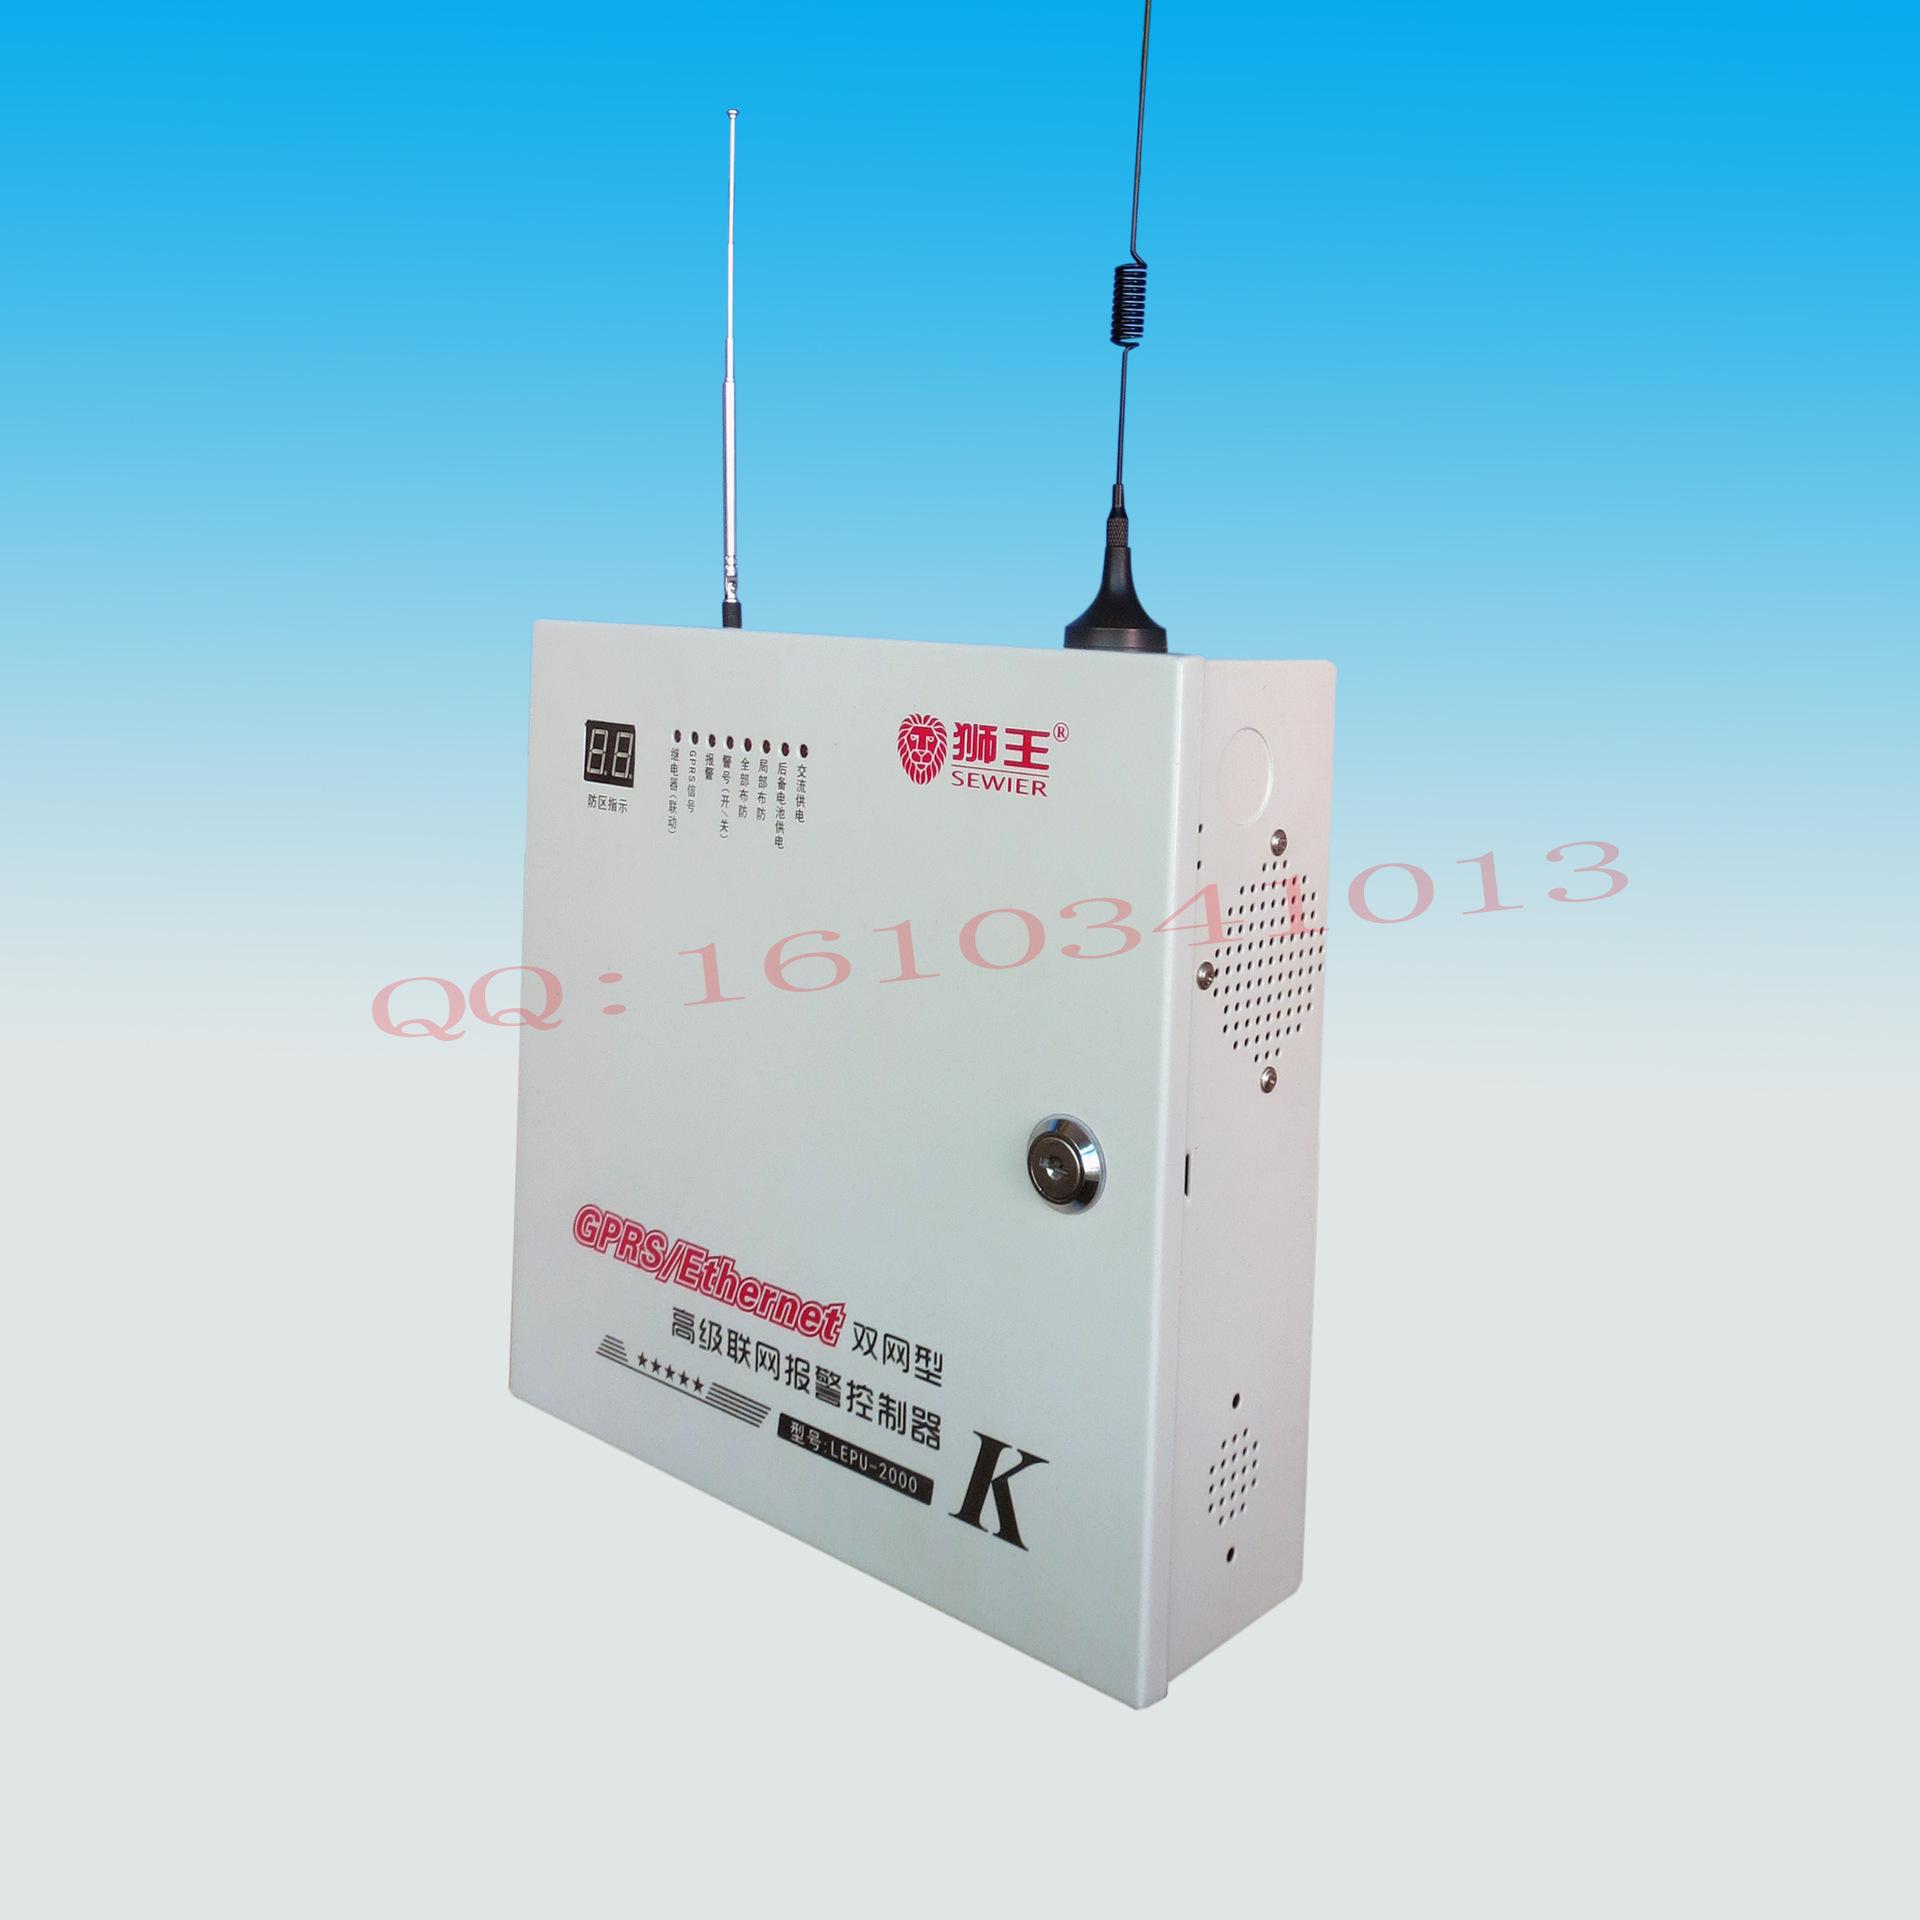 GPRS/Ethernet双网报警器 防盗报警系统